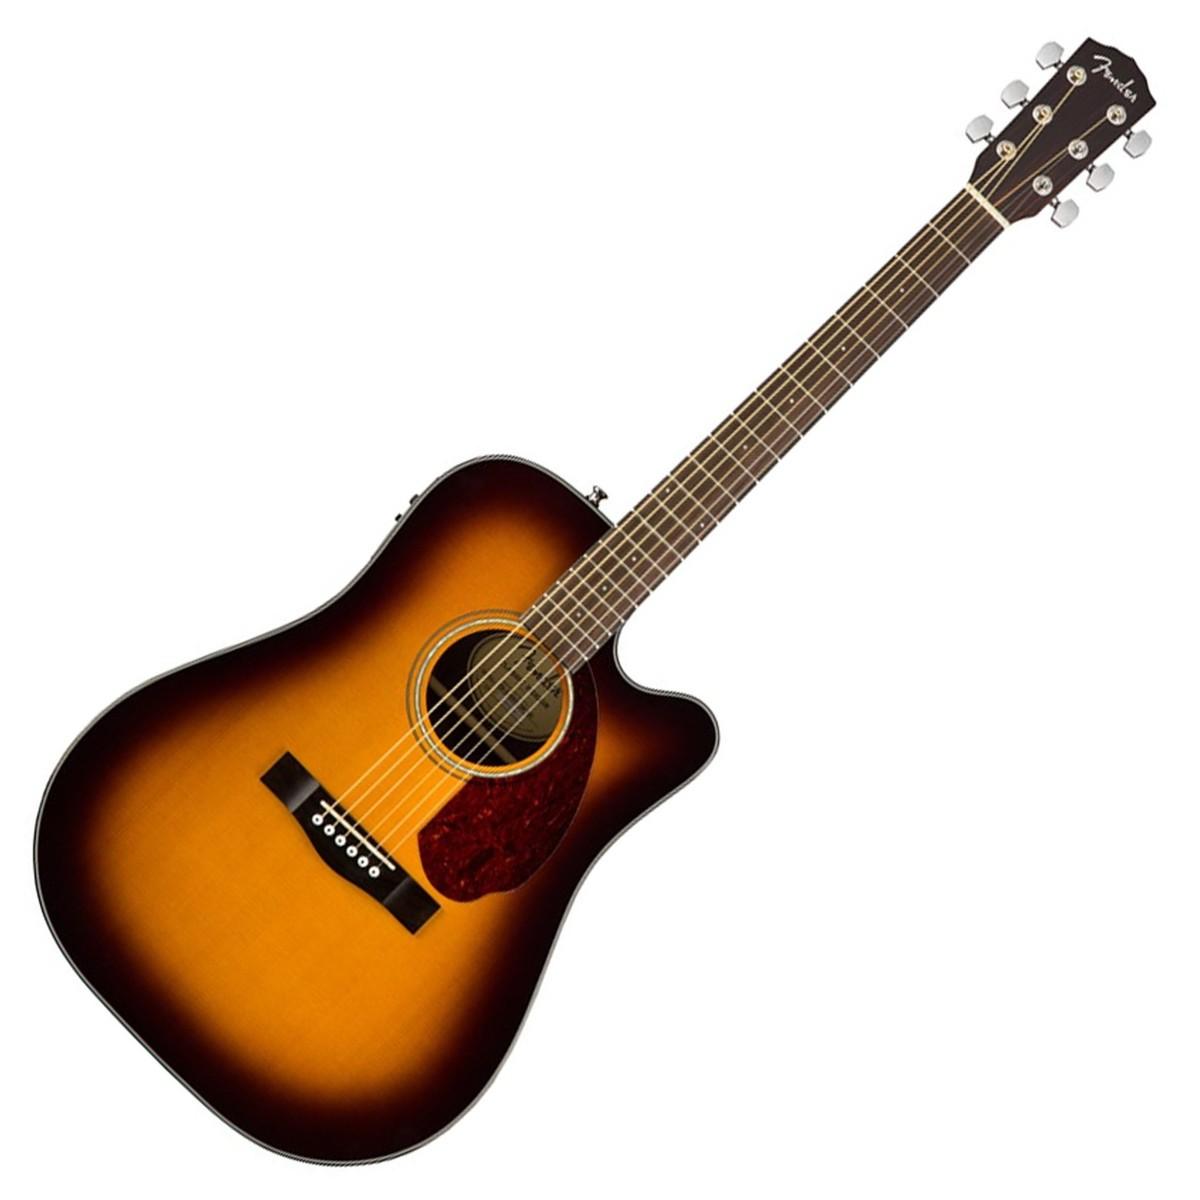 fender cd 140sce dreadnought electro acoustic guitar sunburst at gear4music. Black Bedroom Furniture Sets. Home Design Ideas